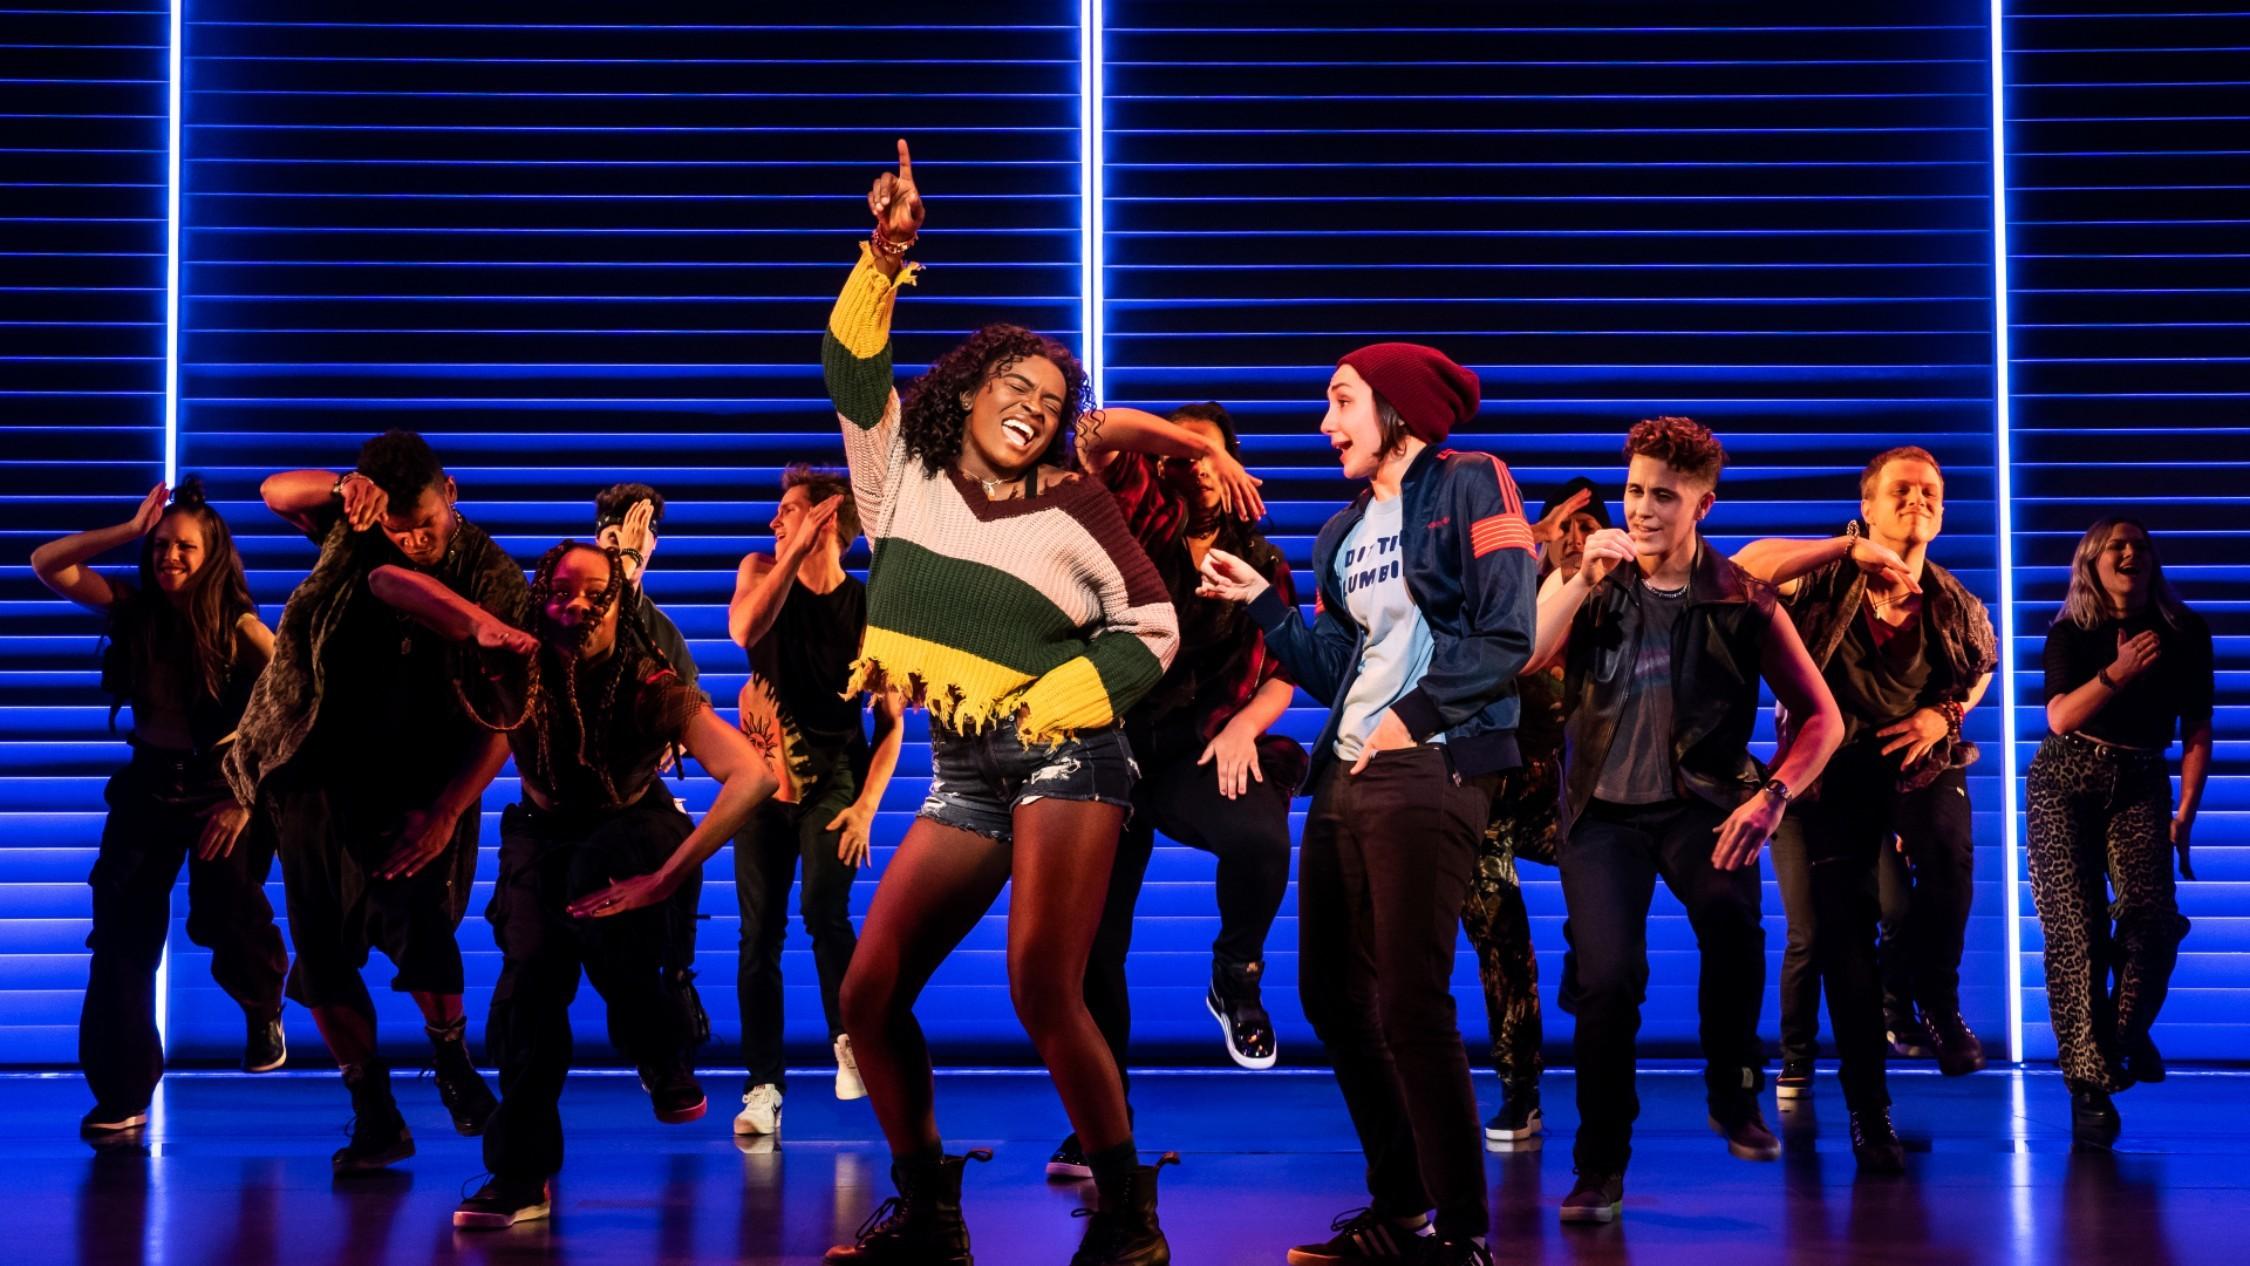 The cast of Alannis Morissette's musical Jagged Little Pill dancing